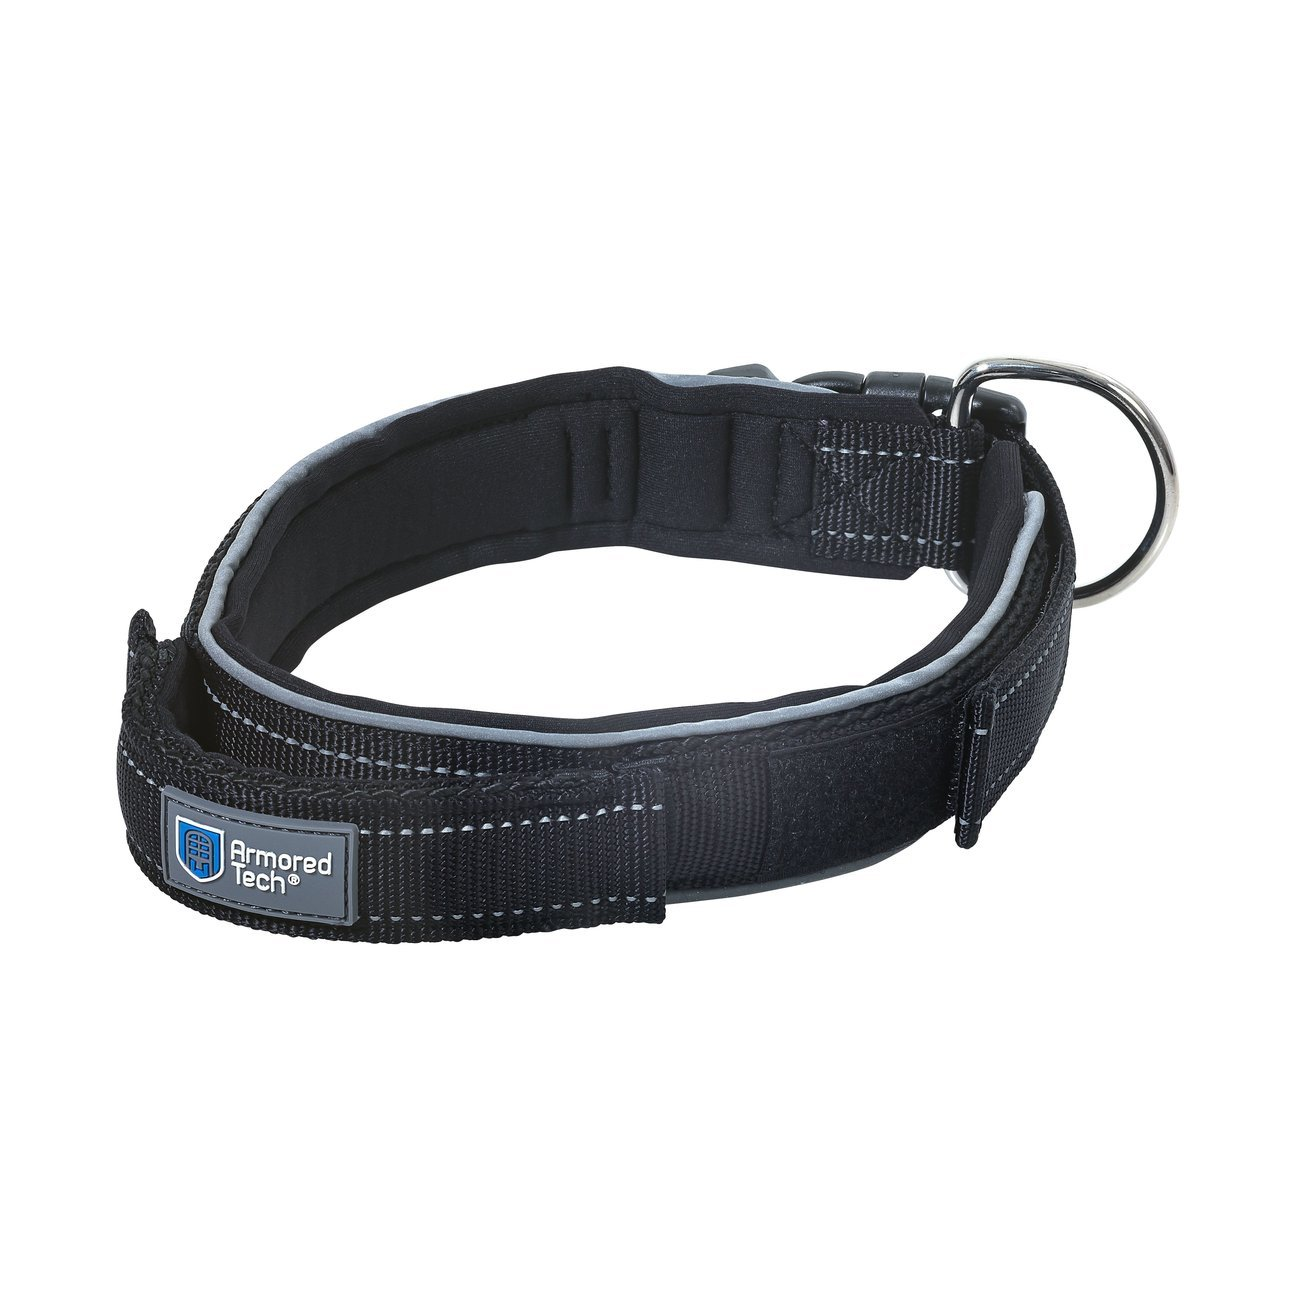 Armored Tech ArmoredTech Hundehalsband, Bild 9